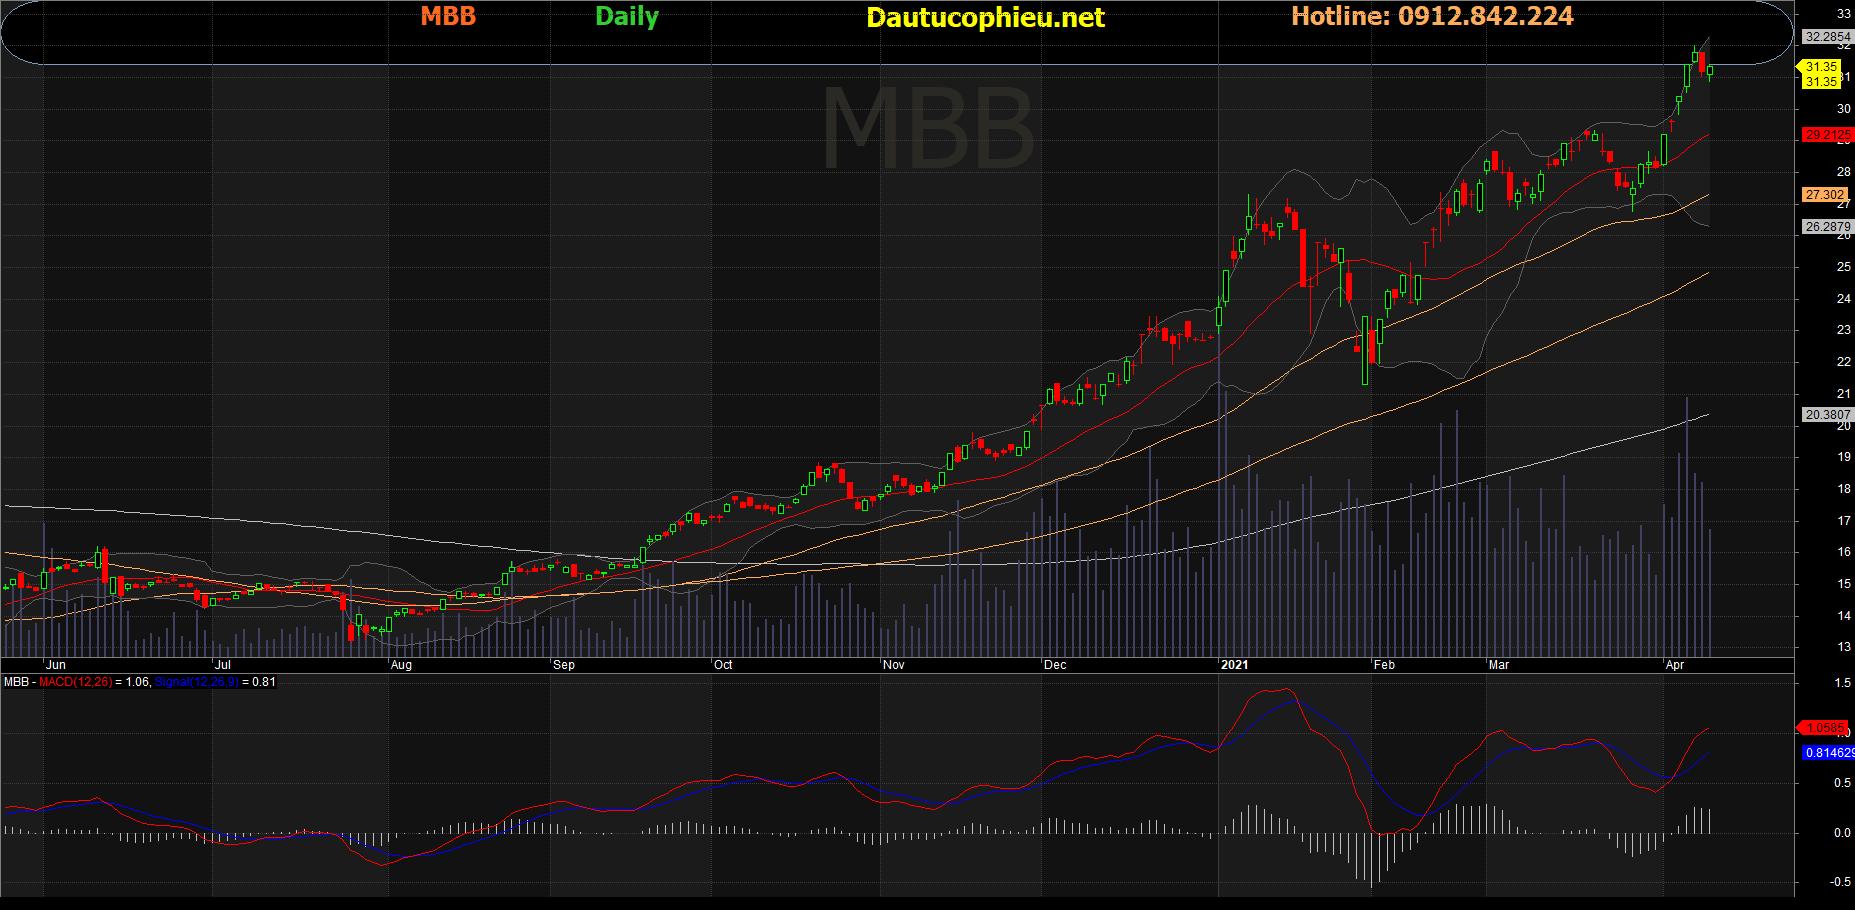 Cổ phiếu MBB